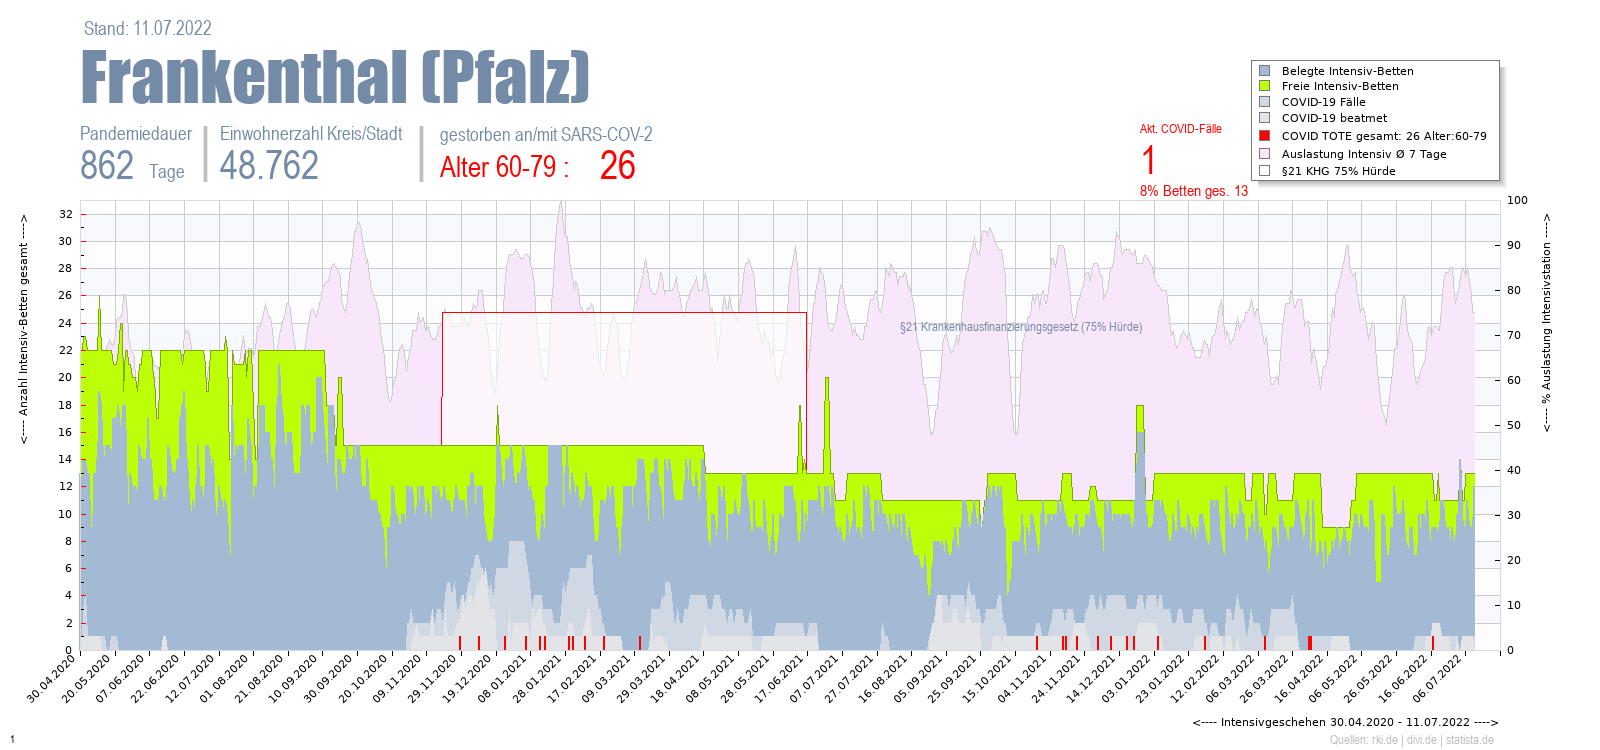 Intensivstation Auslastung Frankenthal (Pfalz) Alter 0-4